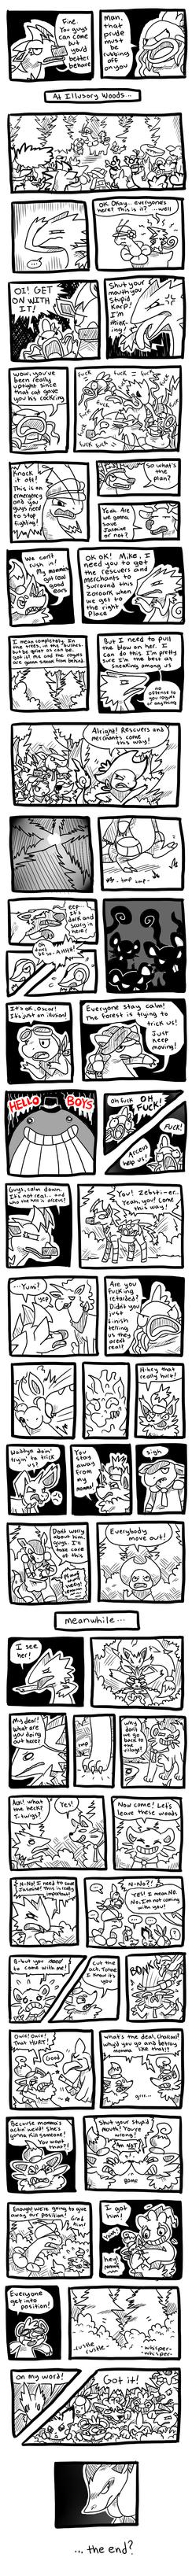 Temporal Terror-Forming! part 2 by Trinosaur